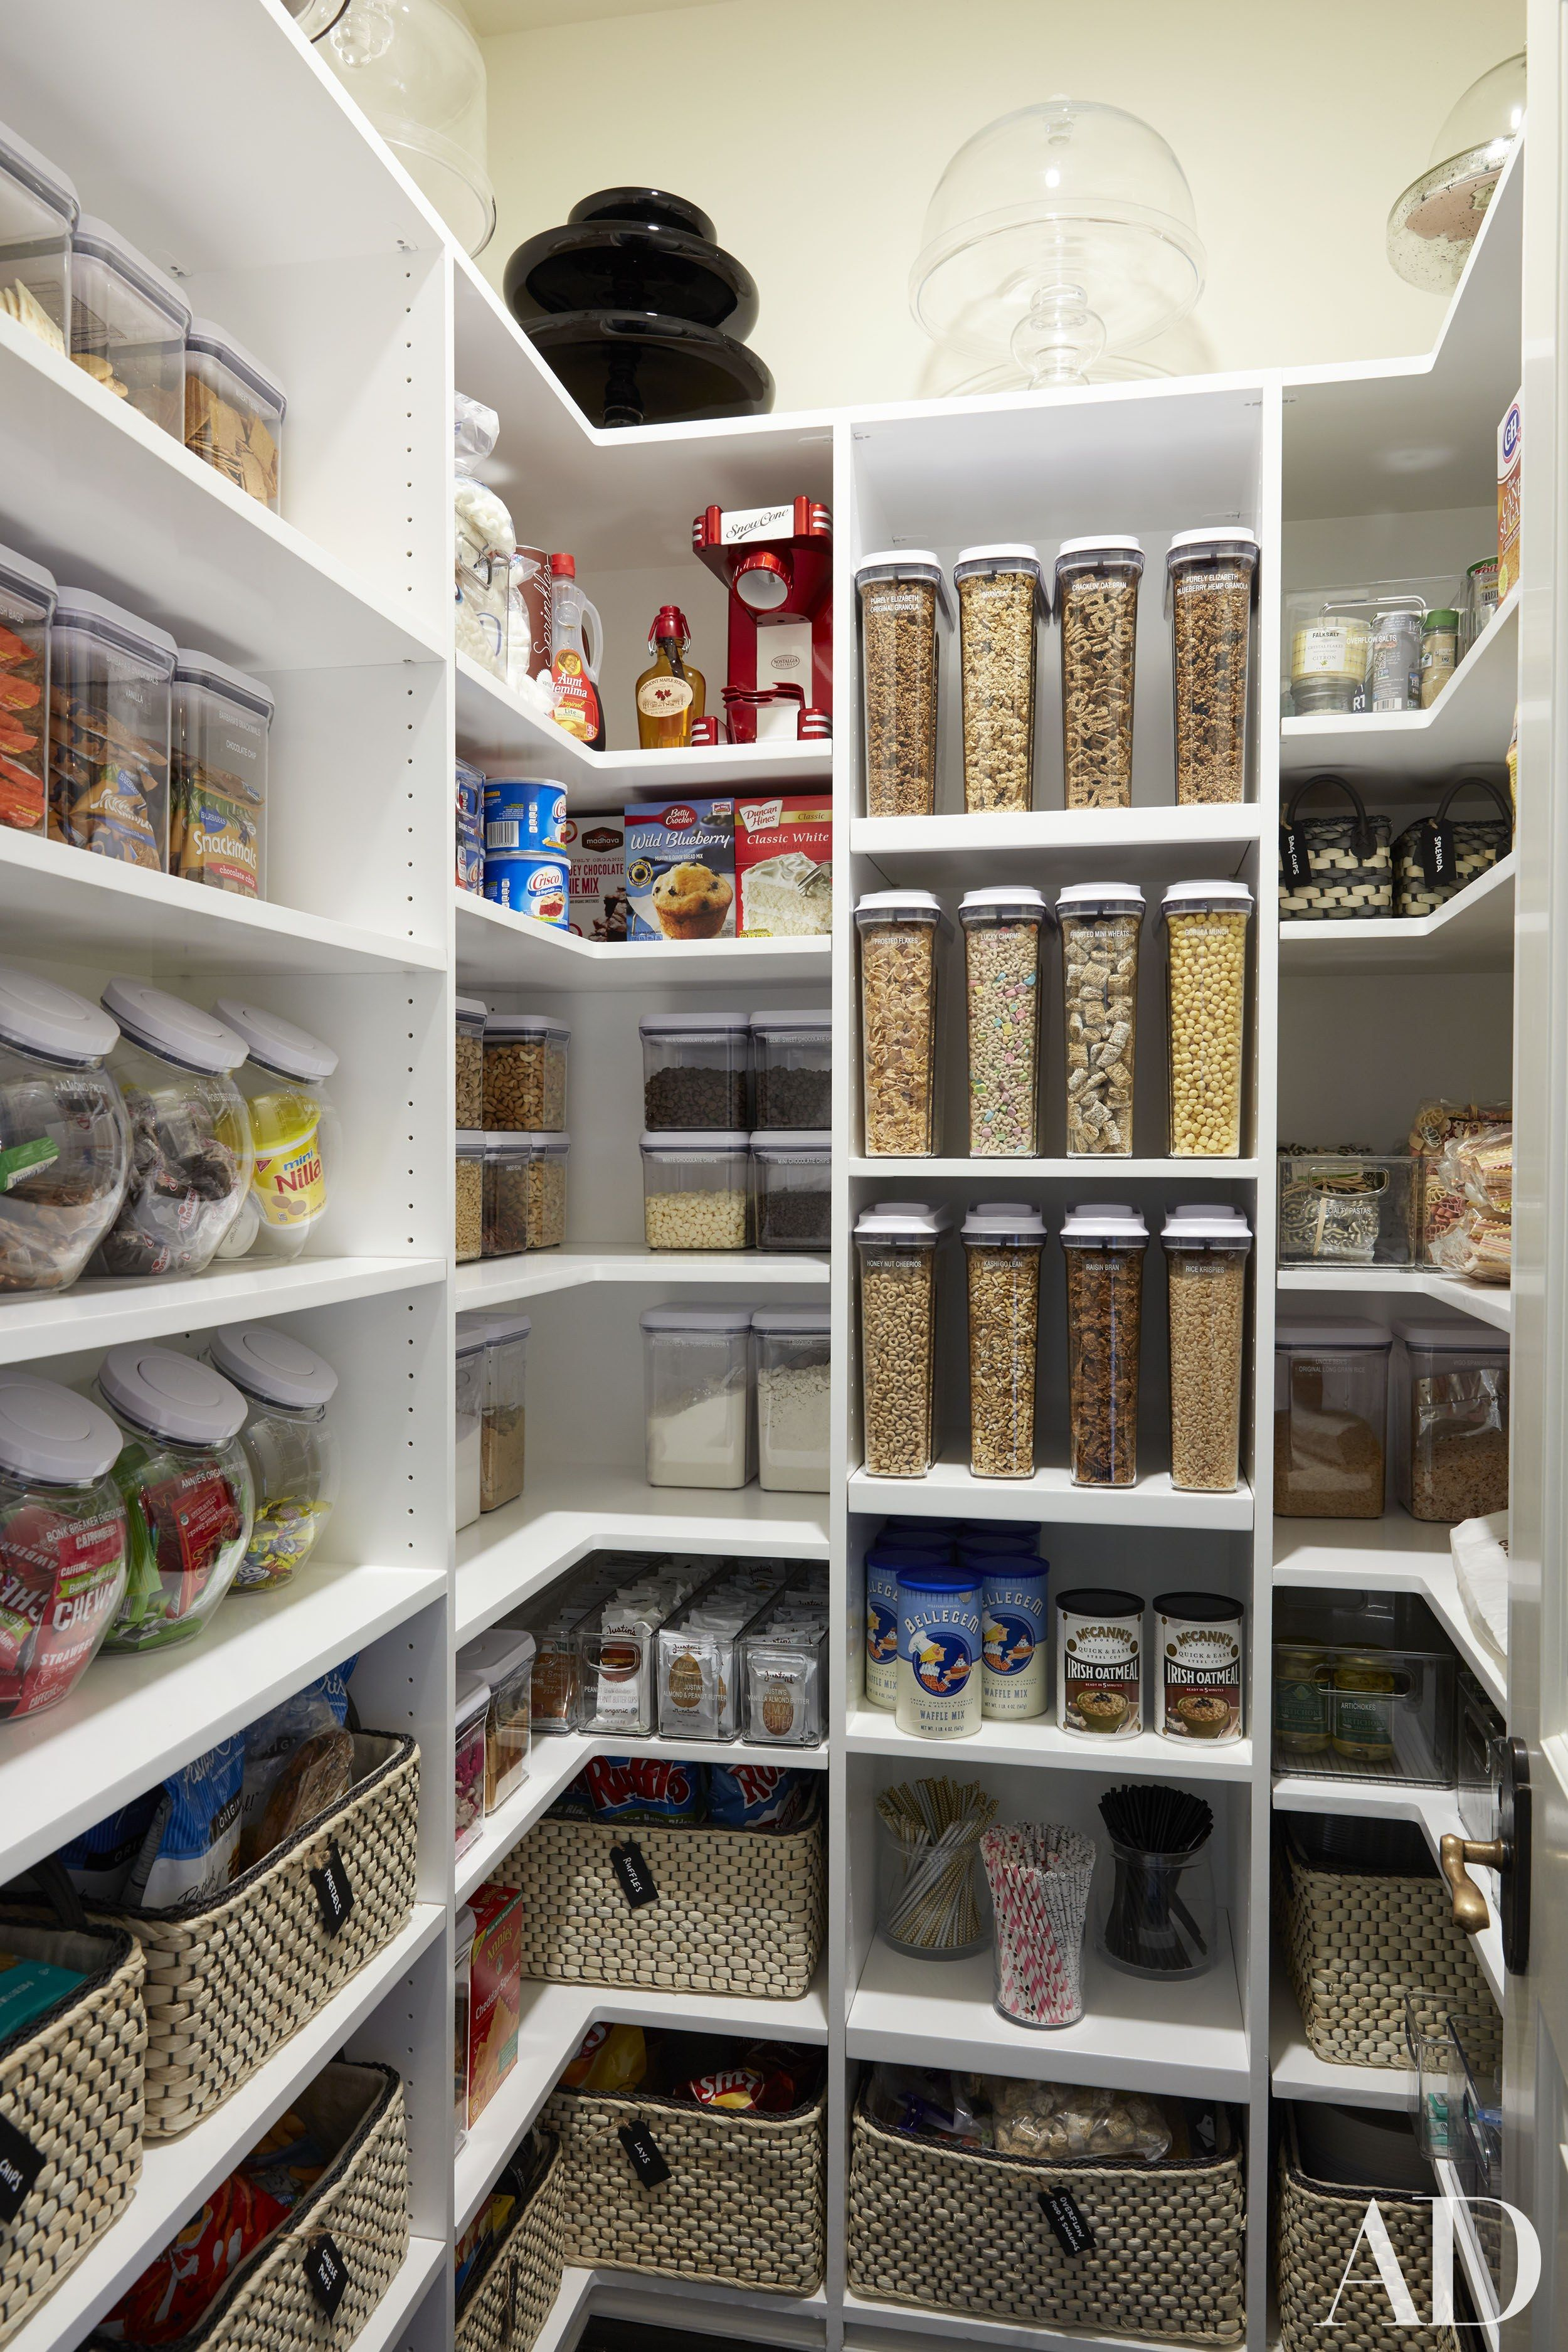 Khloe And Kourtney Kardashian Realize Their Dream Homes In California Pantry OrganisationWalk Closet